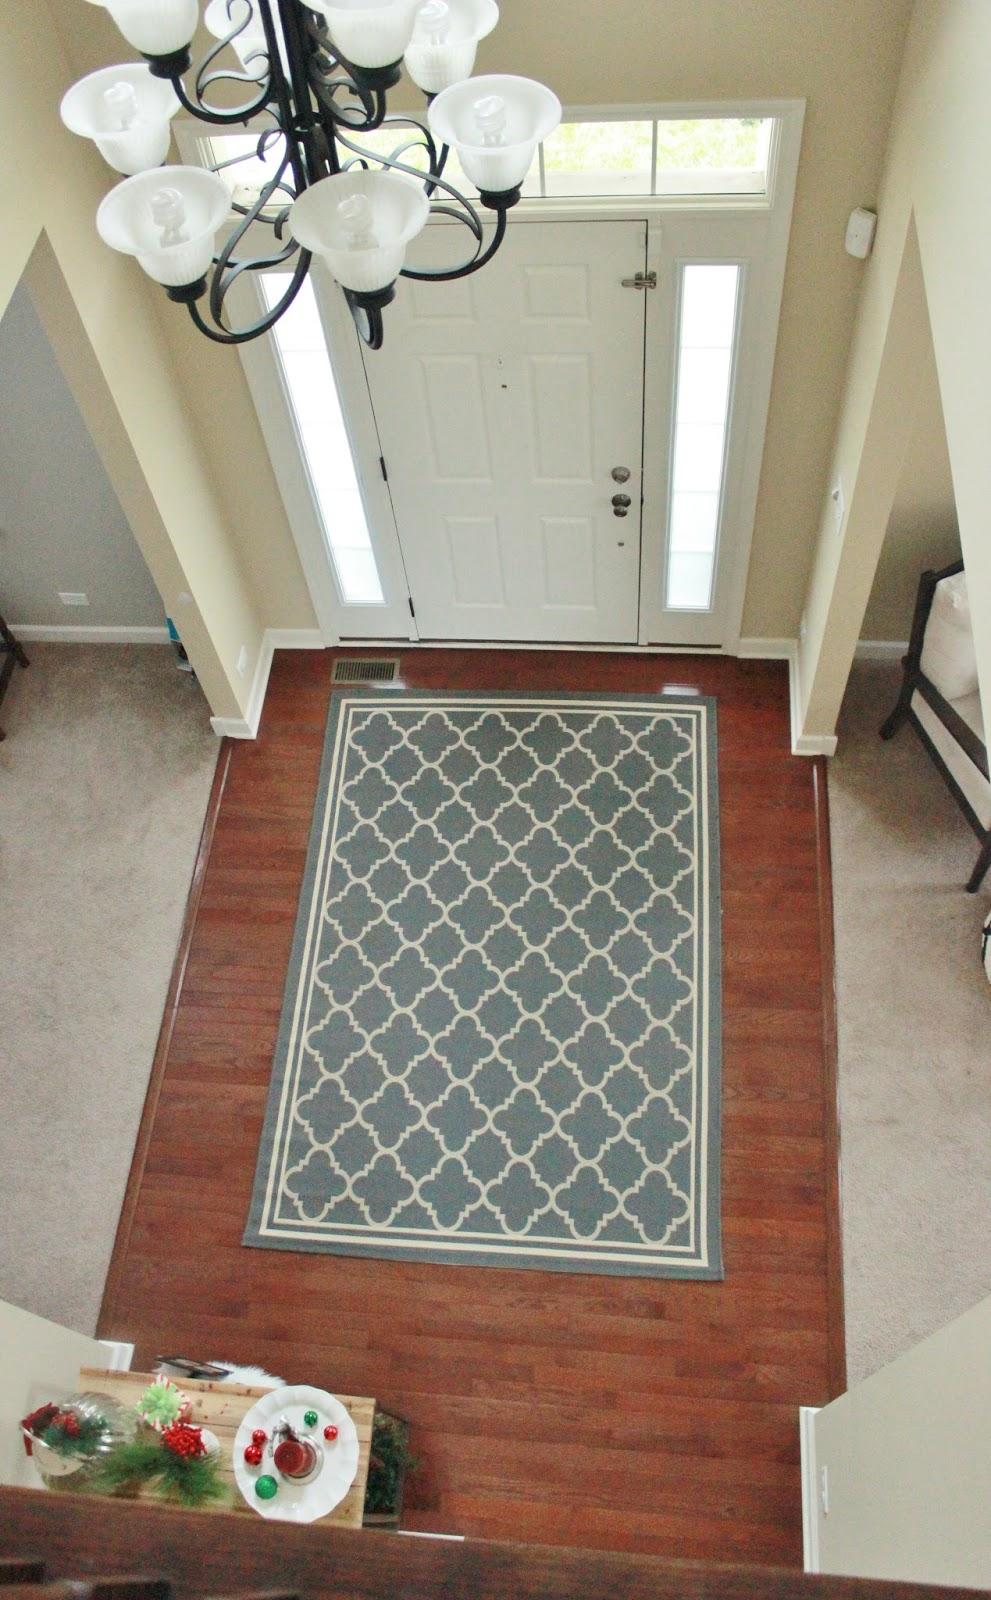 Best Rug Pads for Hardwood Floors